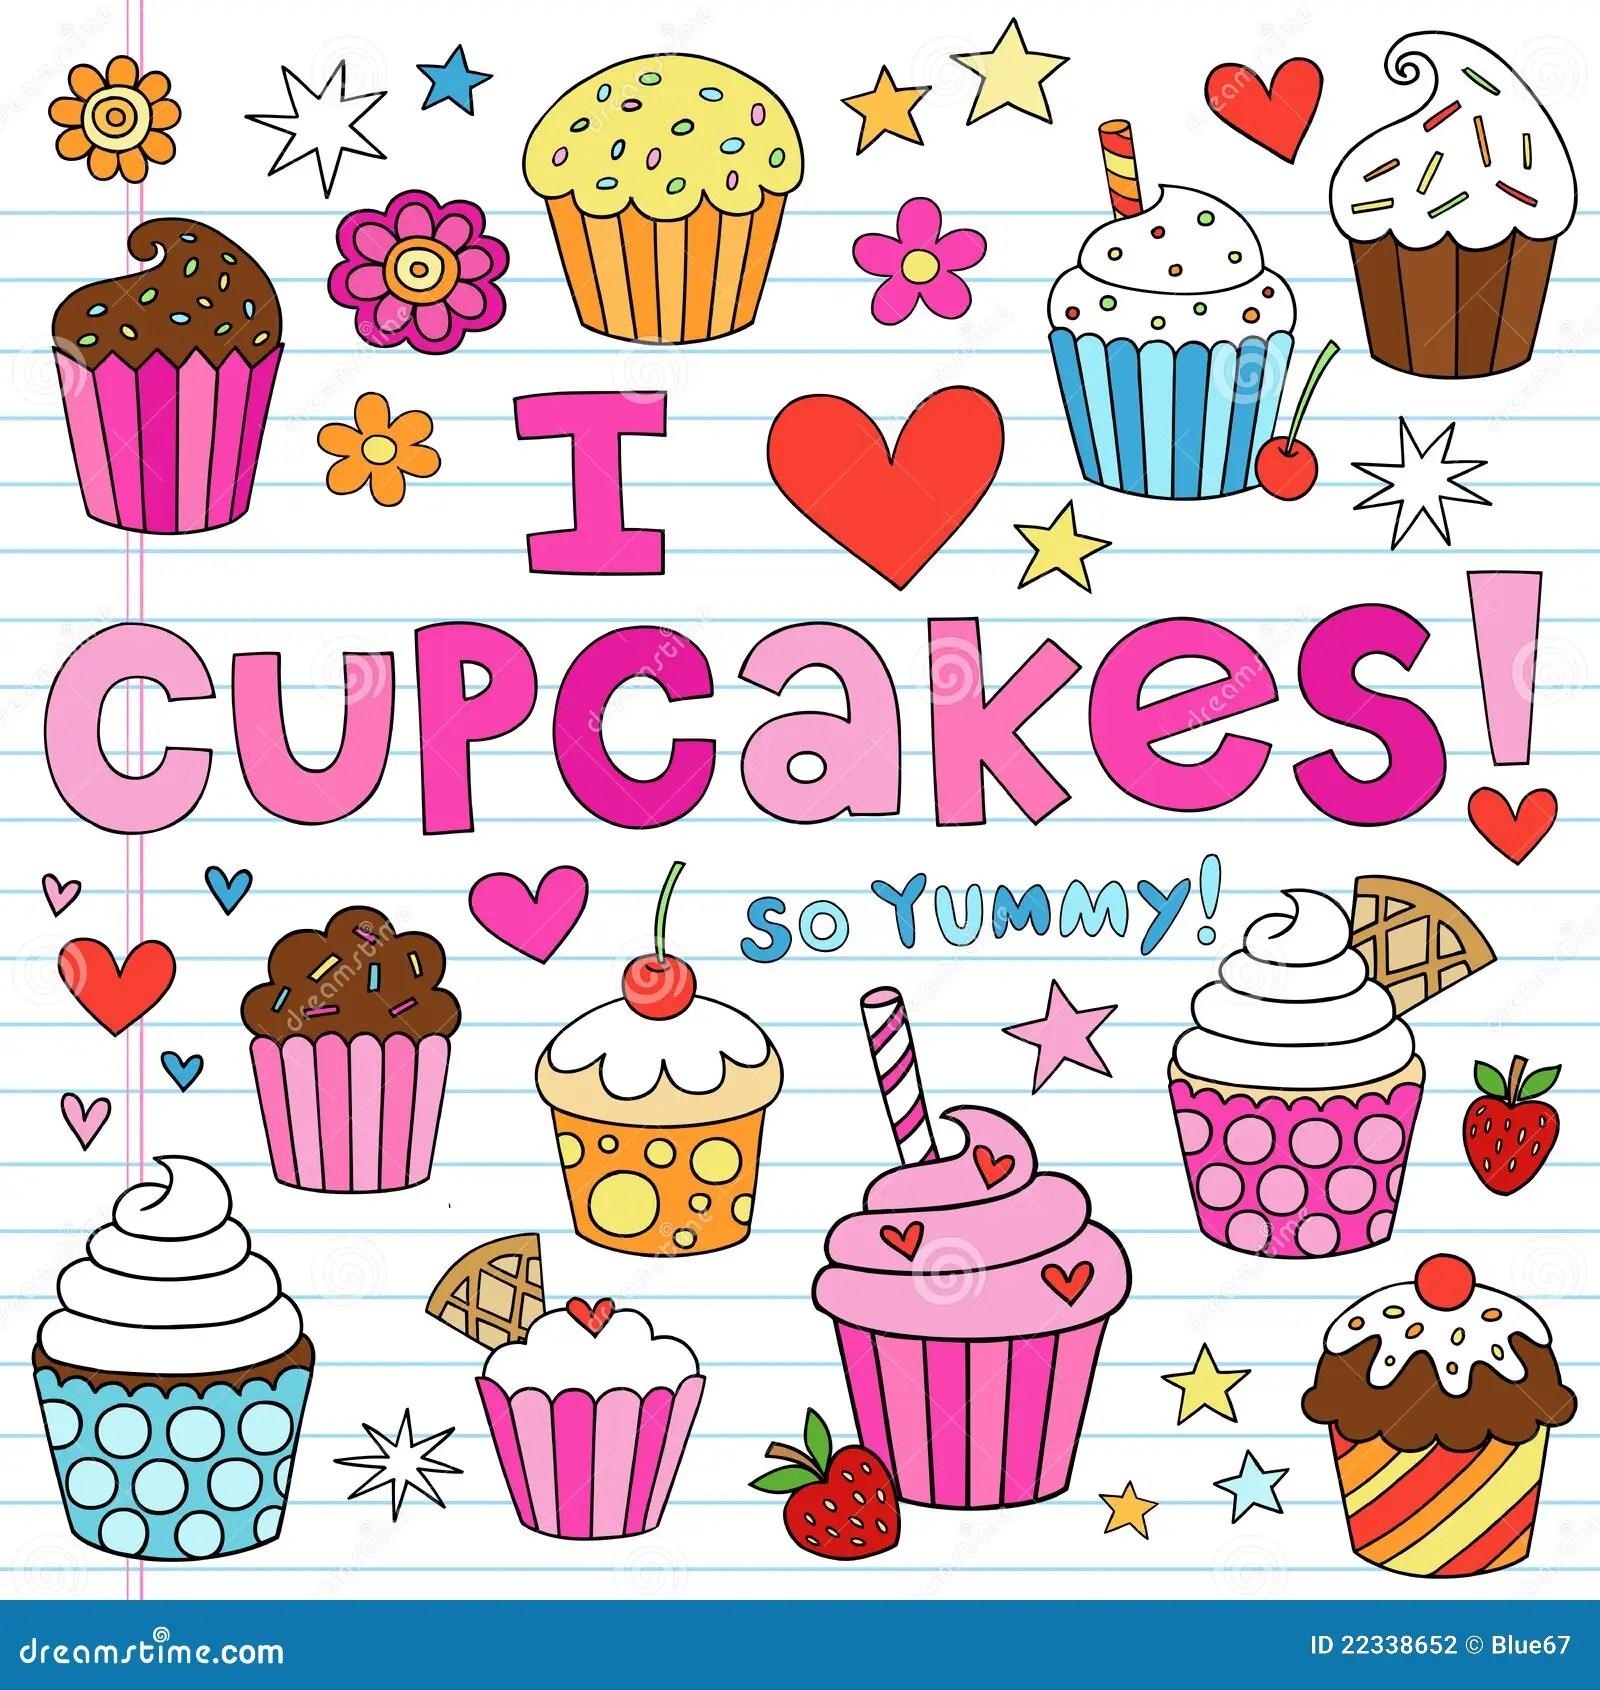 Emoji Wallpaper Quotes I Love Cupcakes Notebook Doodles Vector Elements Stock